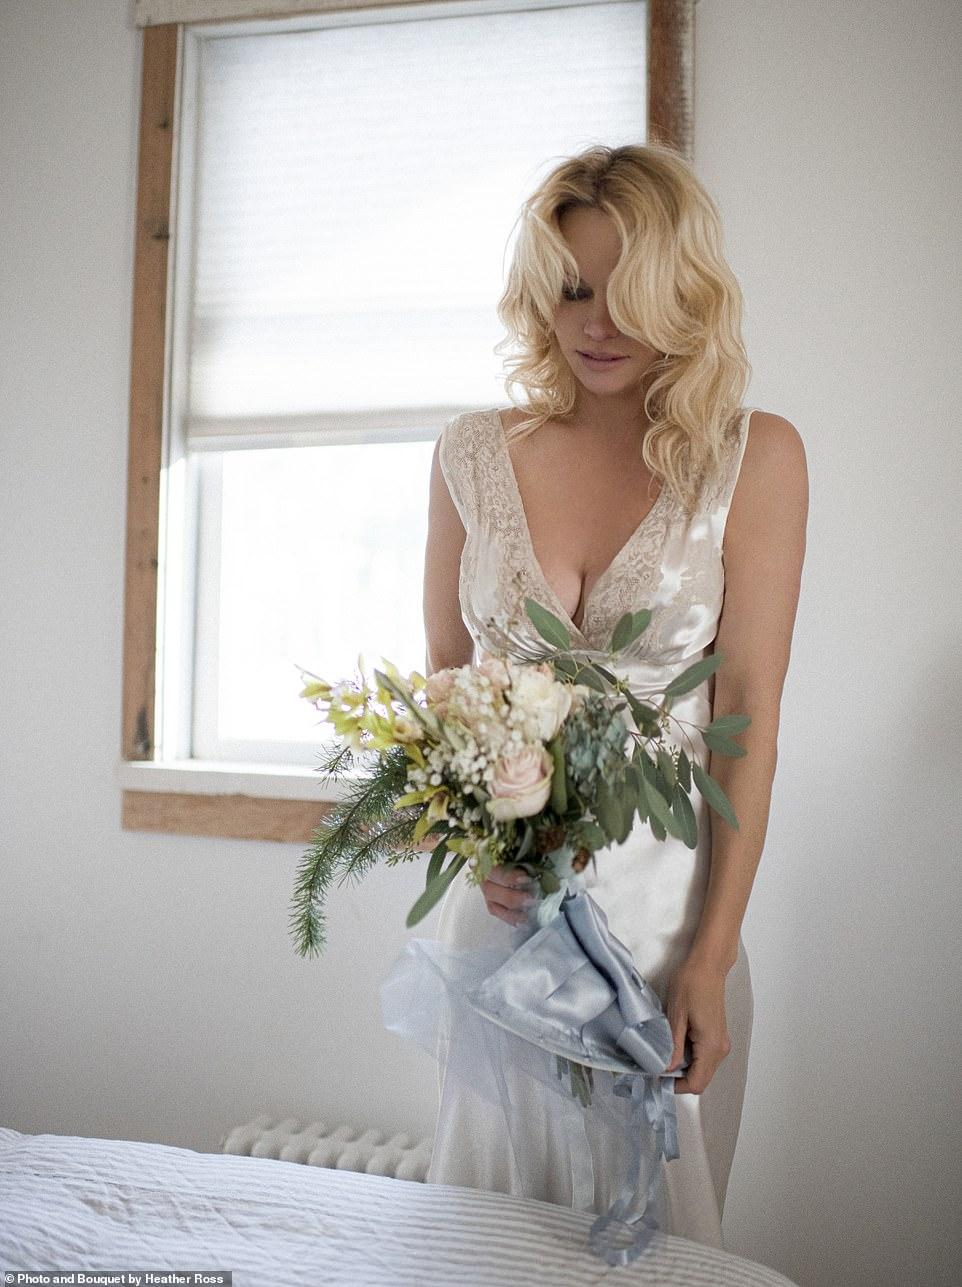 Pamela Anderson Quietly Married Bodyguard Dan Hayhurst on